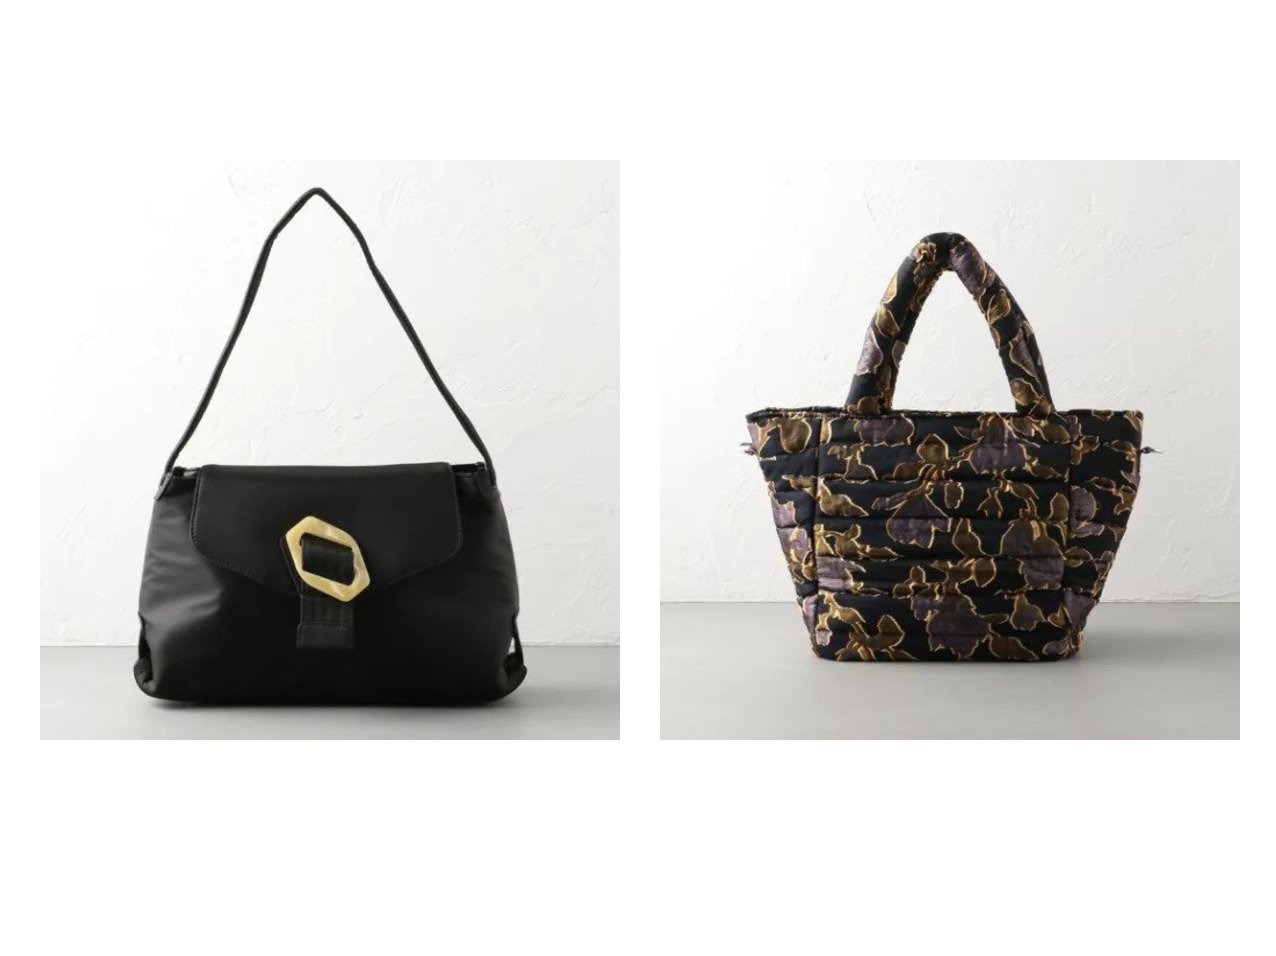 【Odette e Odile/オデット エ オディール】のHVISK BILLOW&HVISK VALLEY おすすめ!人気、トレンド・レディースファッションの通販  おすすめで人気の流行・トレンド、ファッションの通販商品 メンズファッション・キッズファッション・インテリア・家具・レディースファッション・服の通販 founy(ファニー) https://founy.com/ ファッション Fashion レディースファッション WOMEN カラフル フラップ ショルダー |ID:crp329100000014408